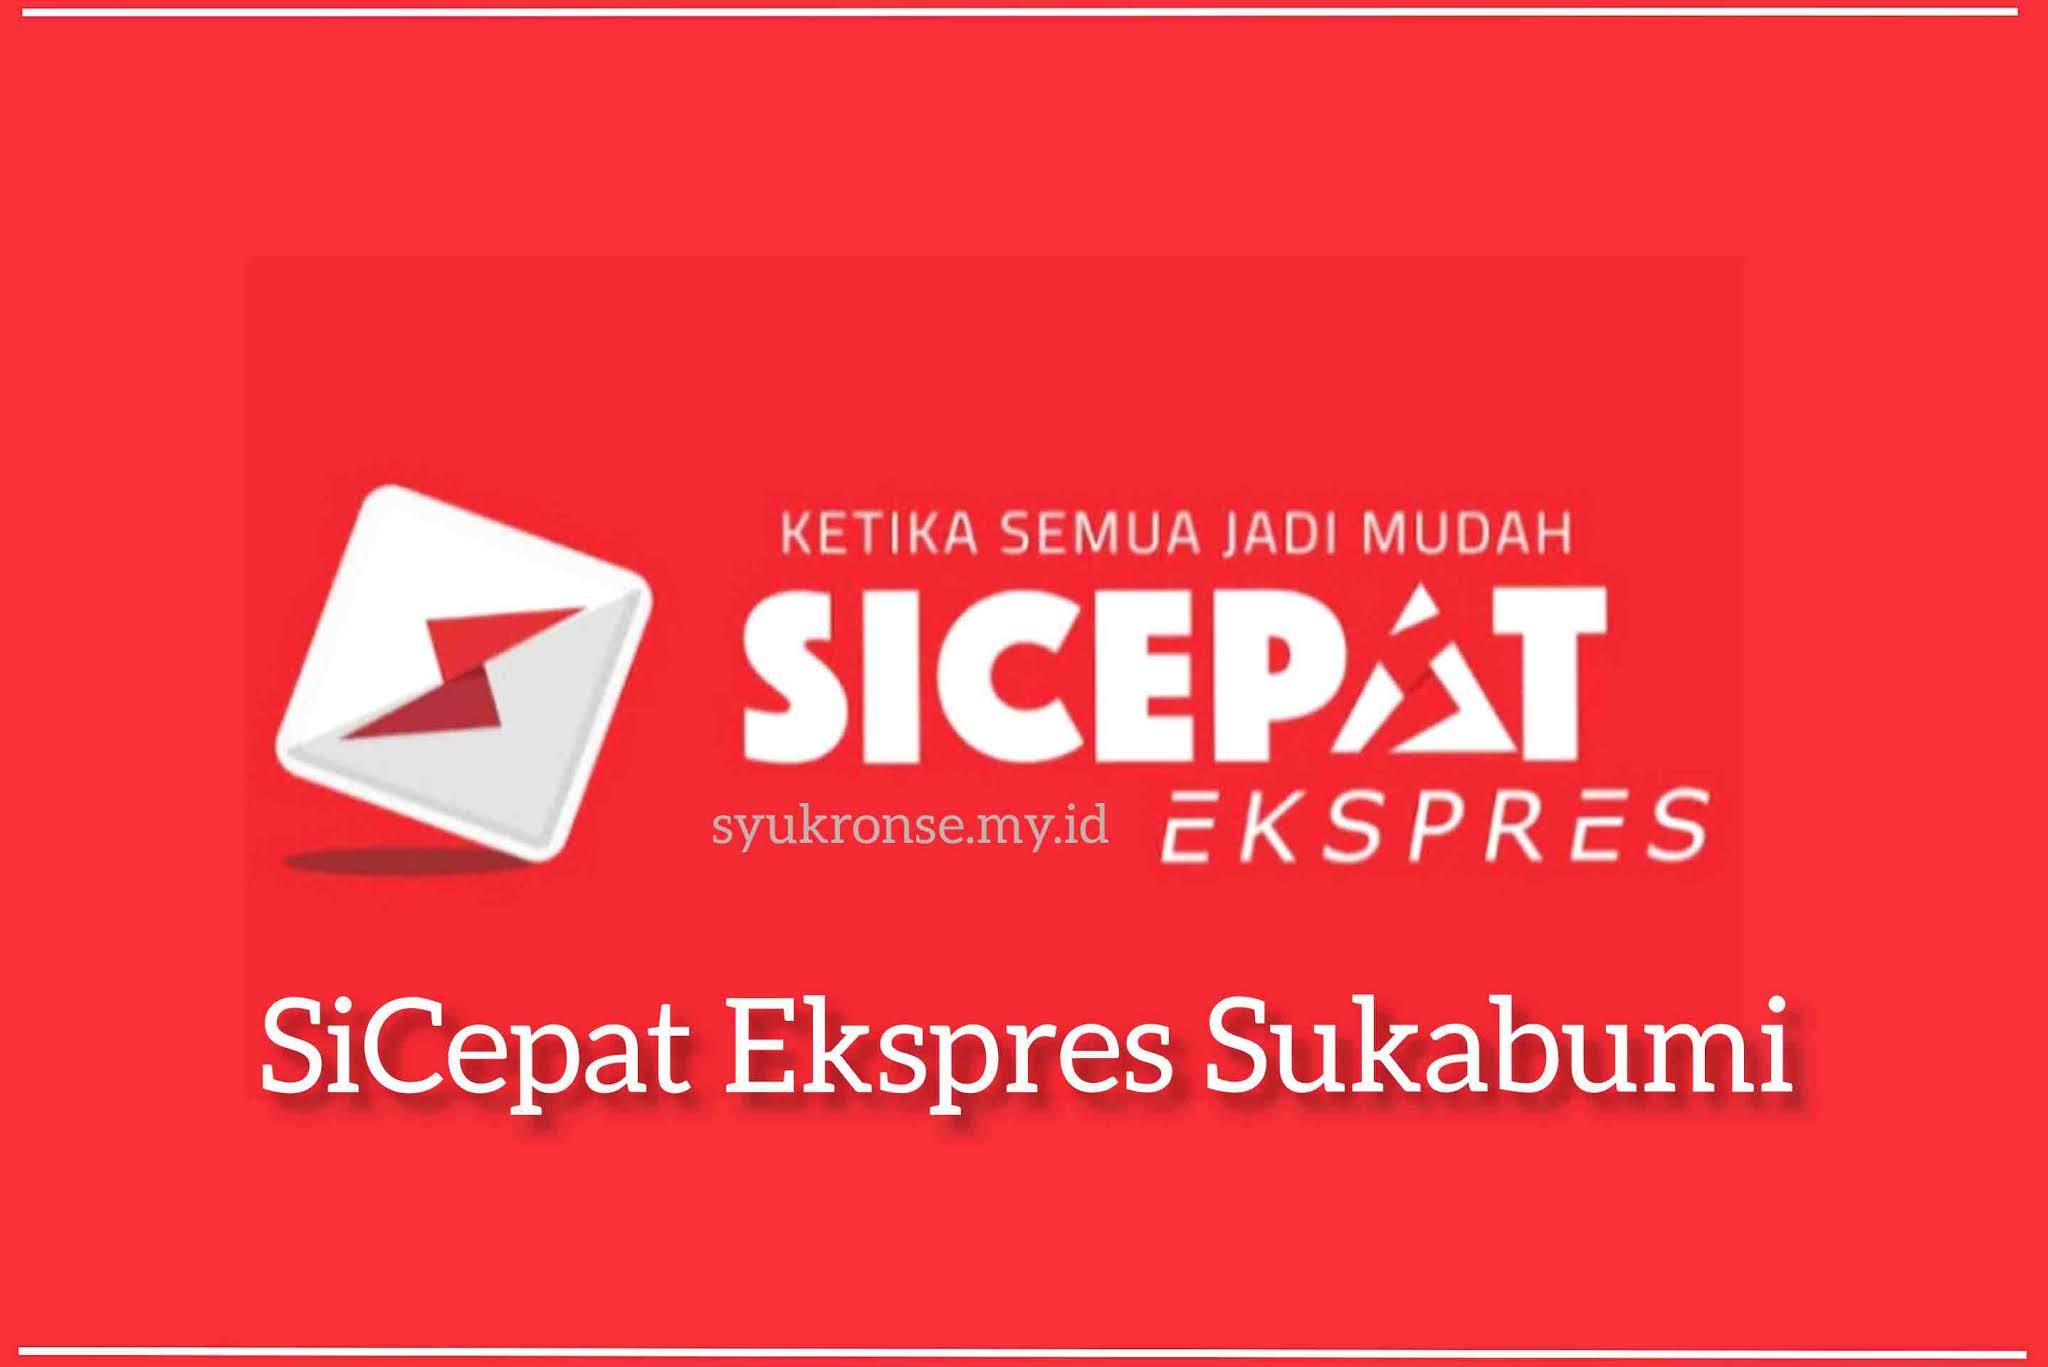 SiCepat Ekspres Sukabumi